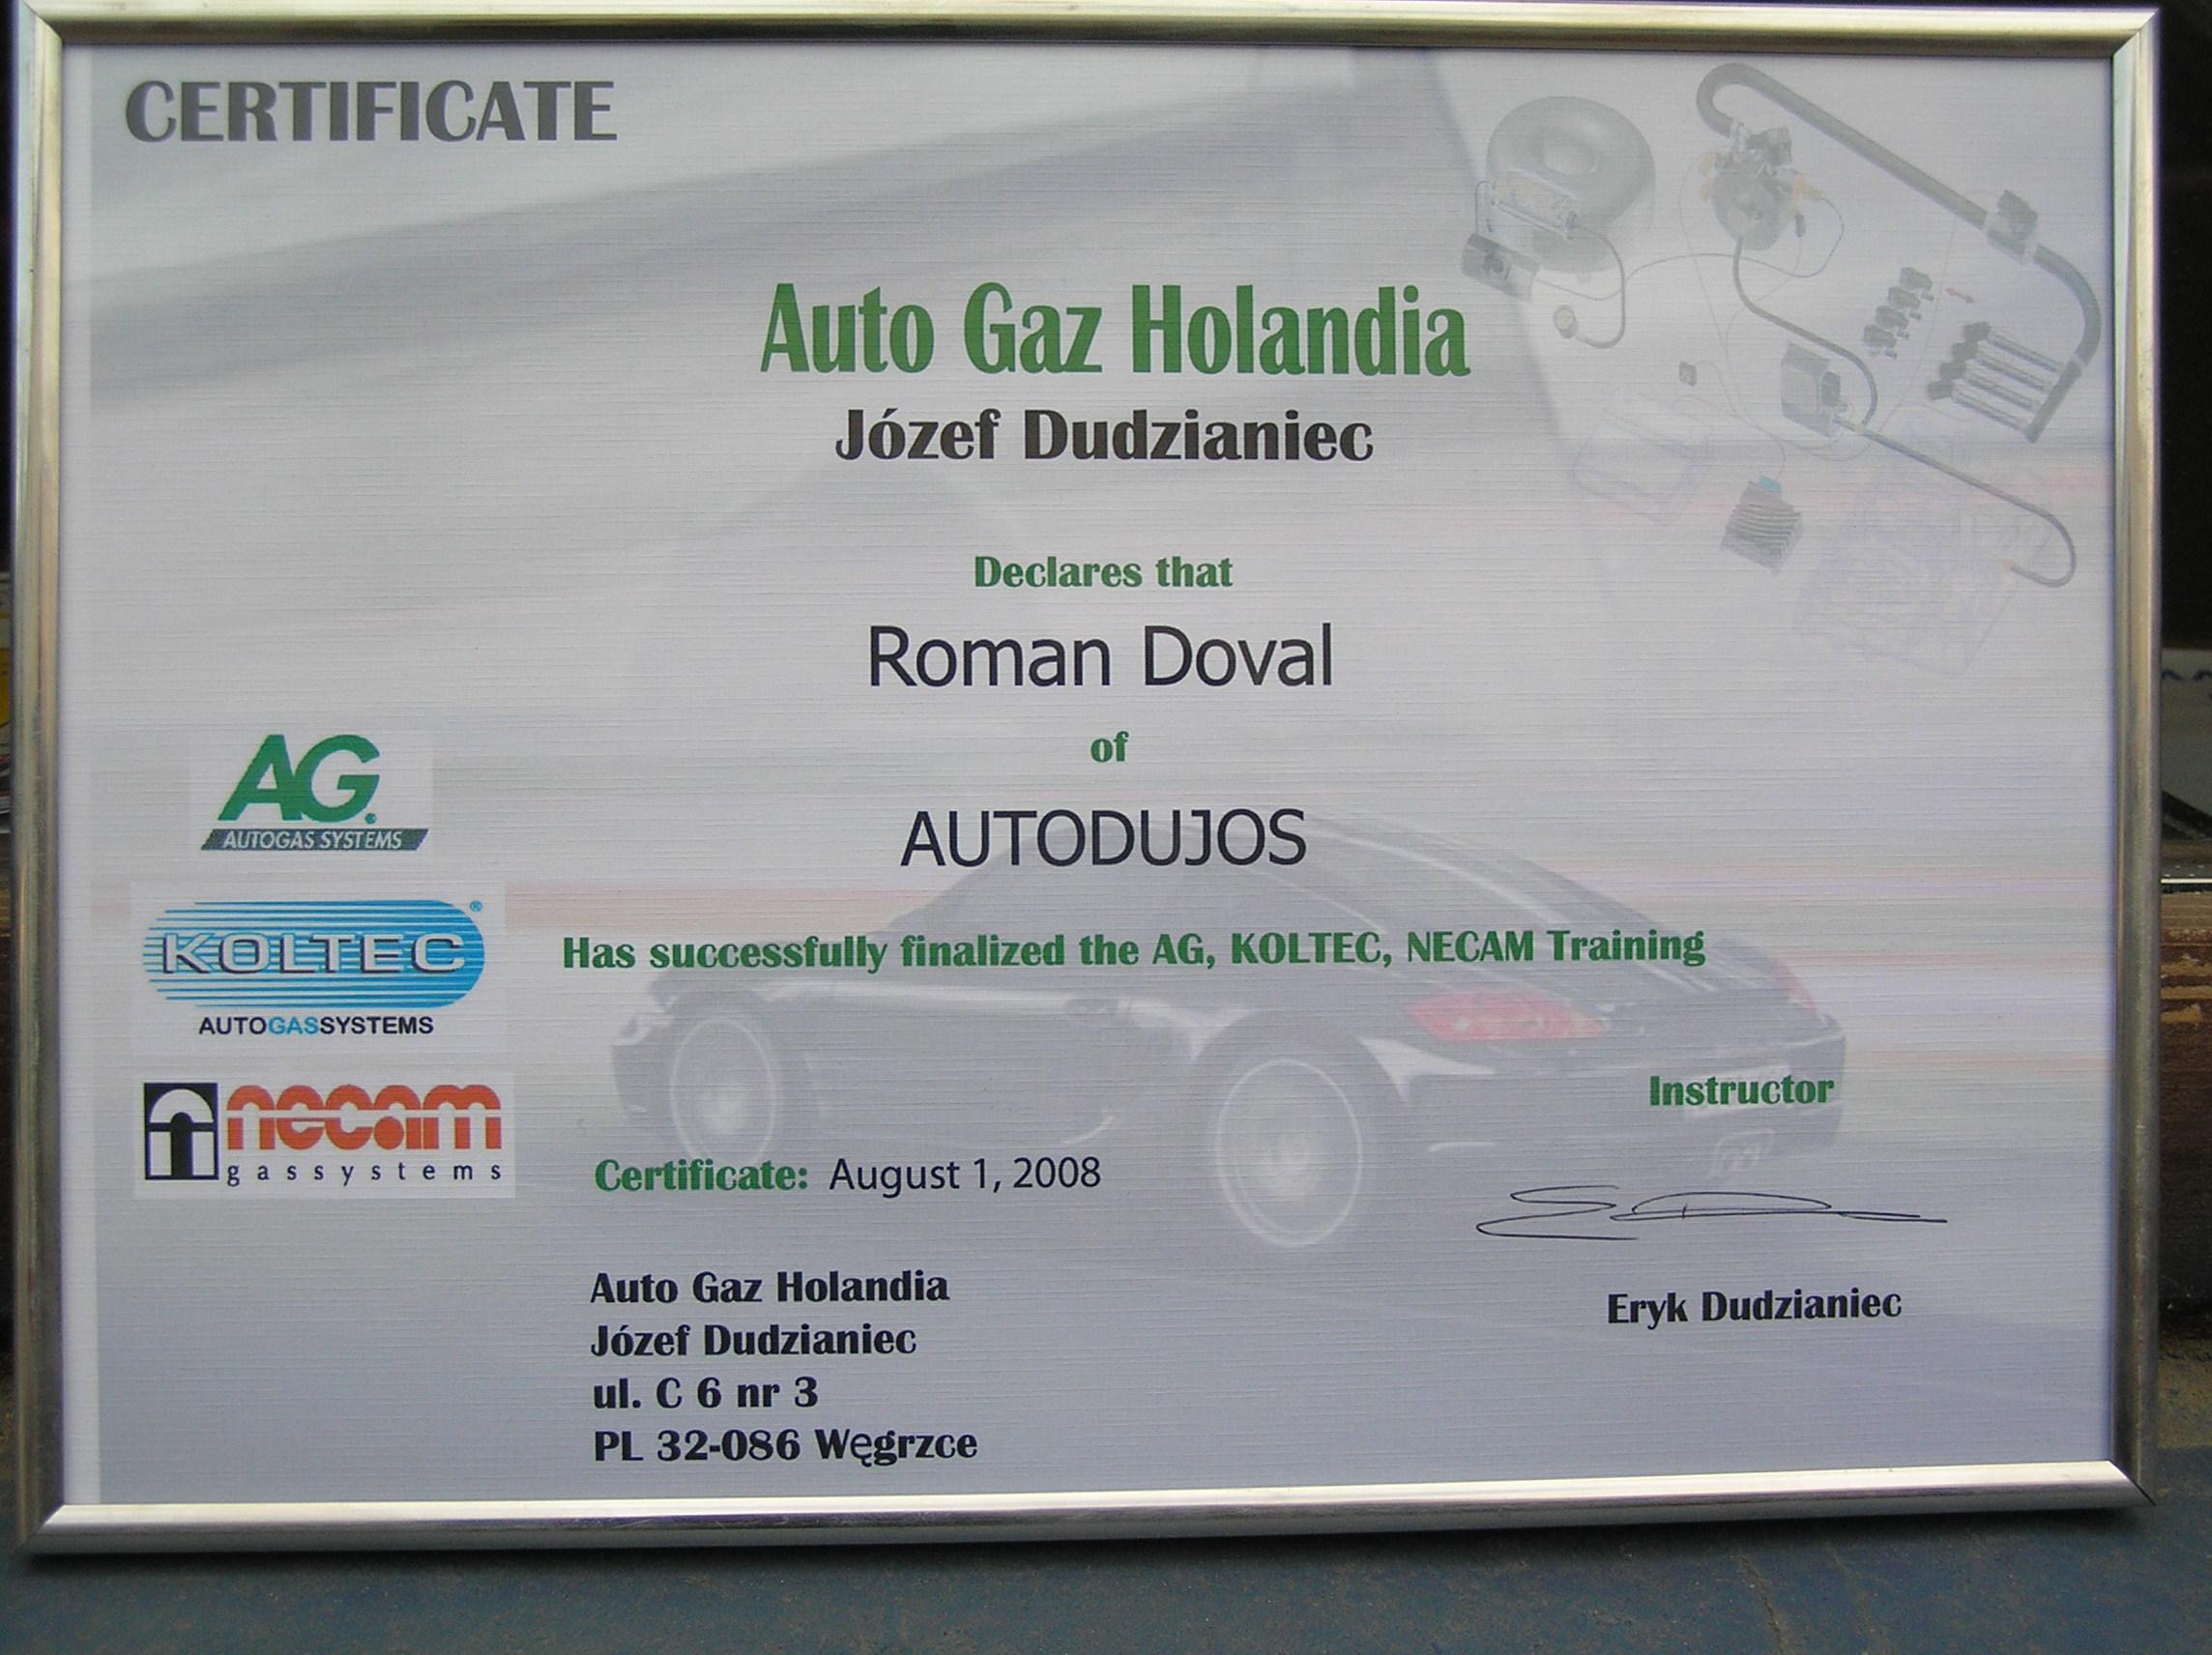 sertifikatas - auto gaz holandia